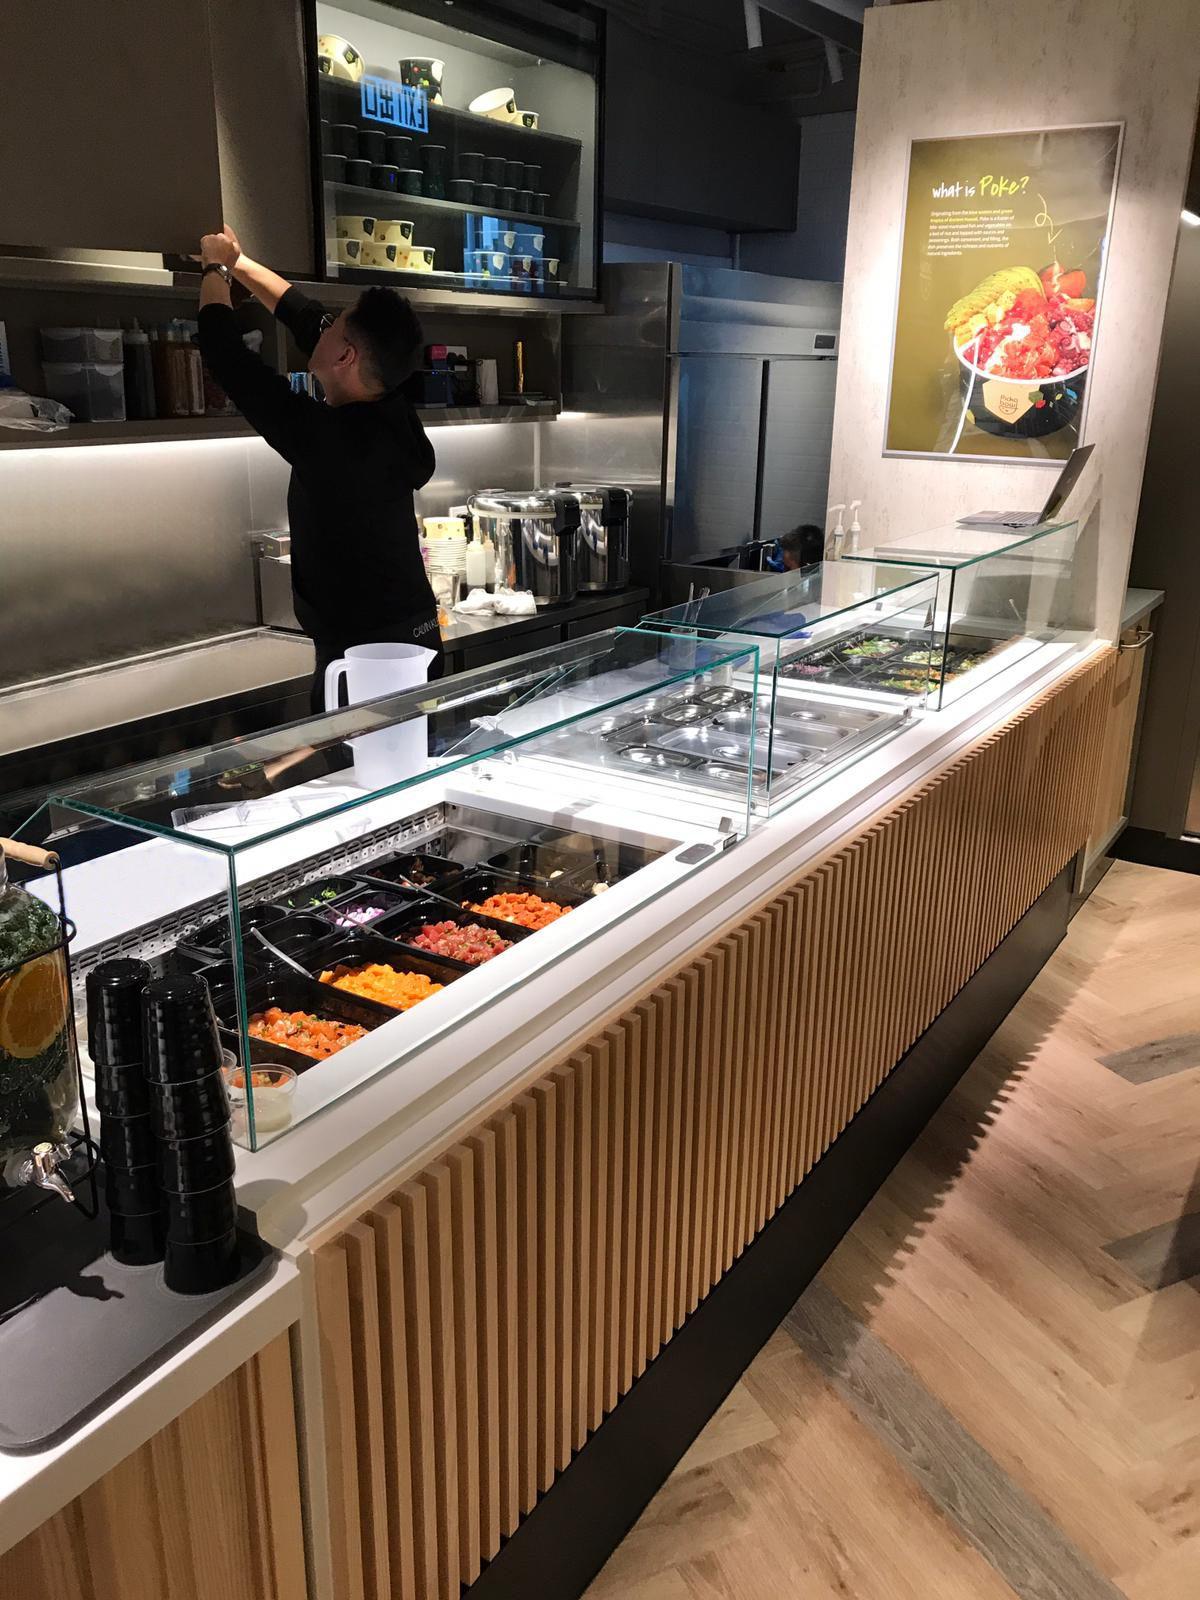 FRESCO vitrinas selfservice, servery counters, display